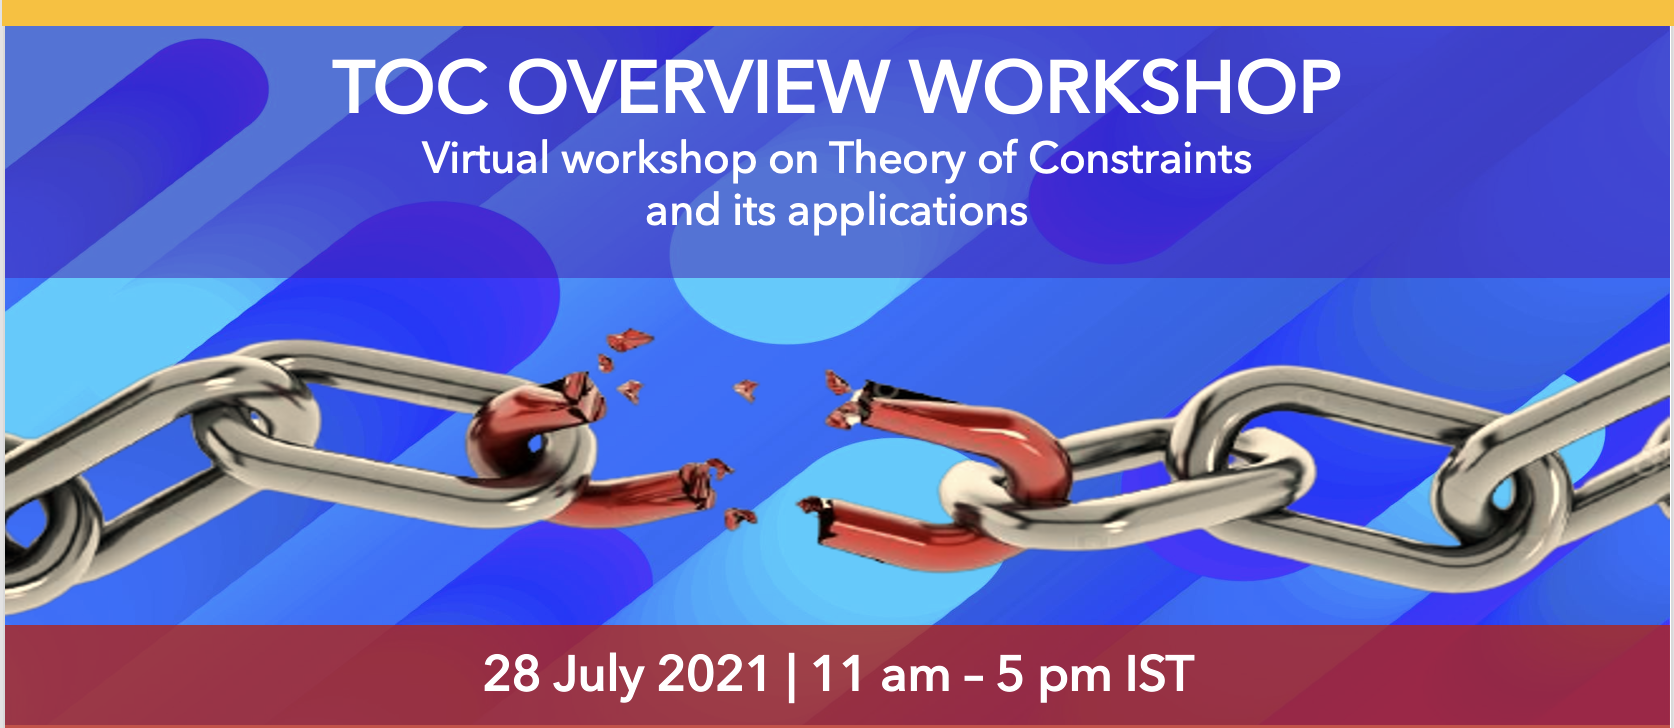 toc-overview-workshop